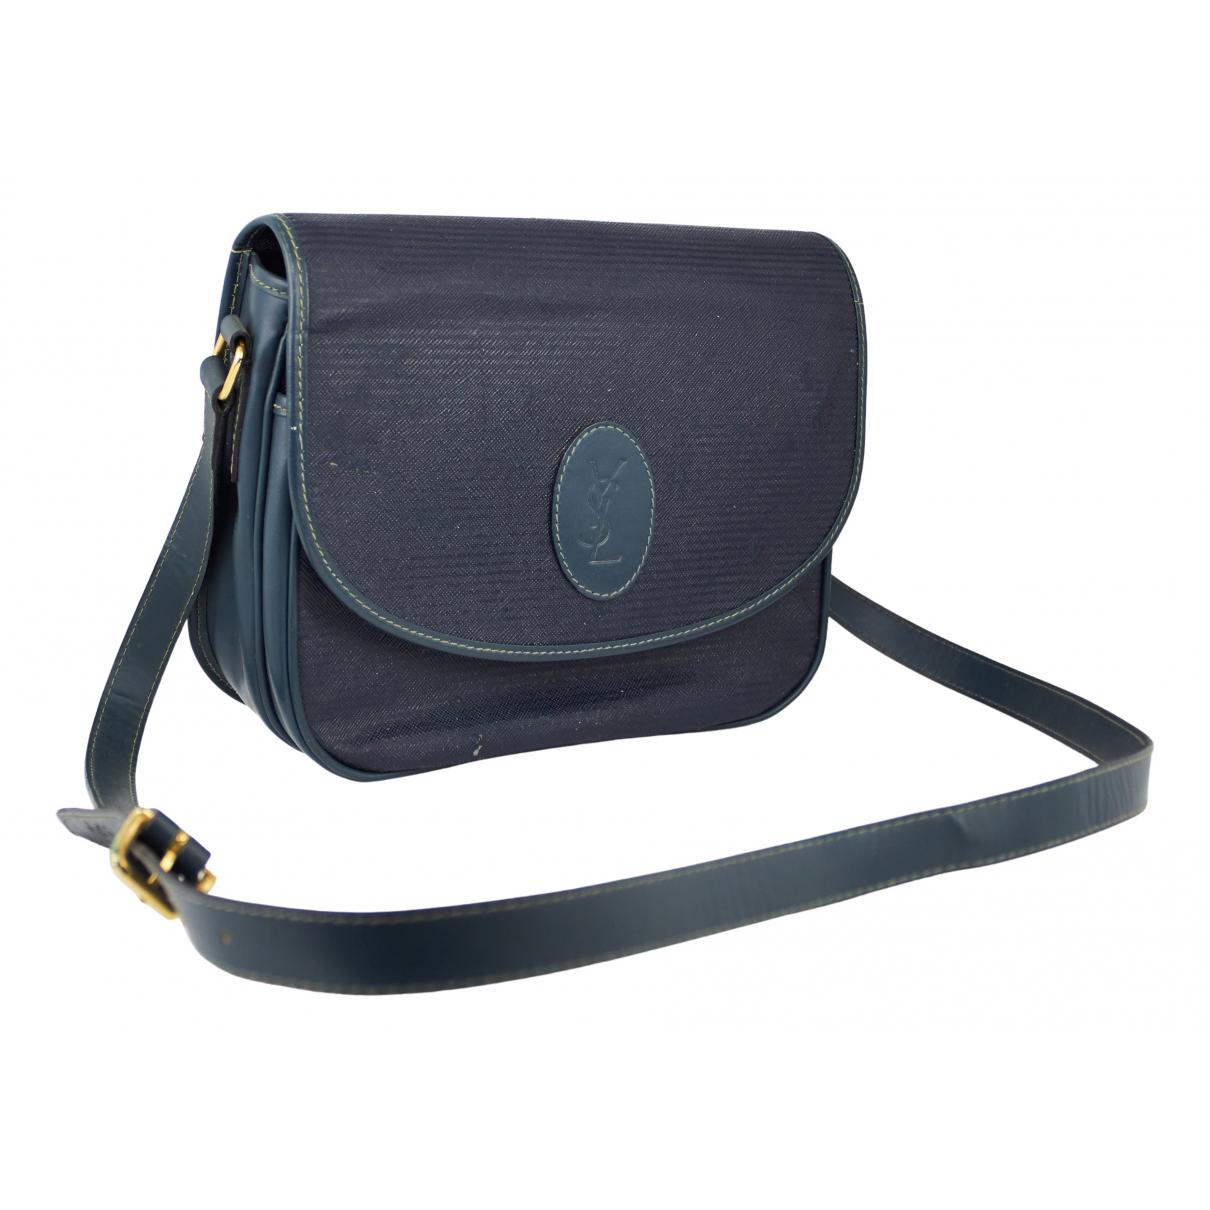 Yves Saint Laurent N Blue Cloth handbag for Women N